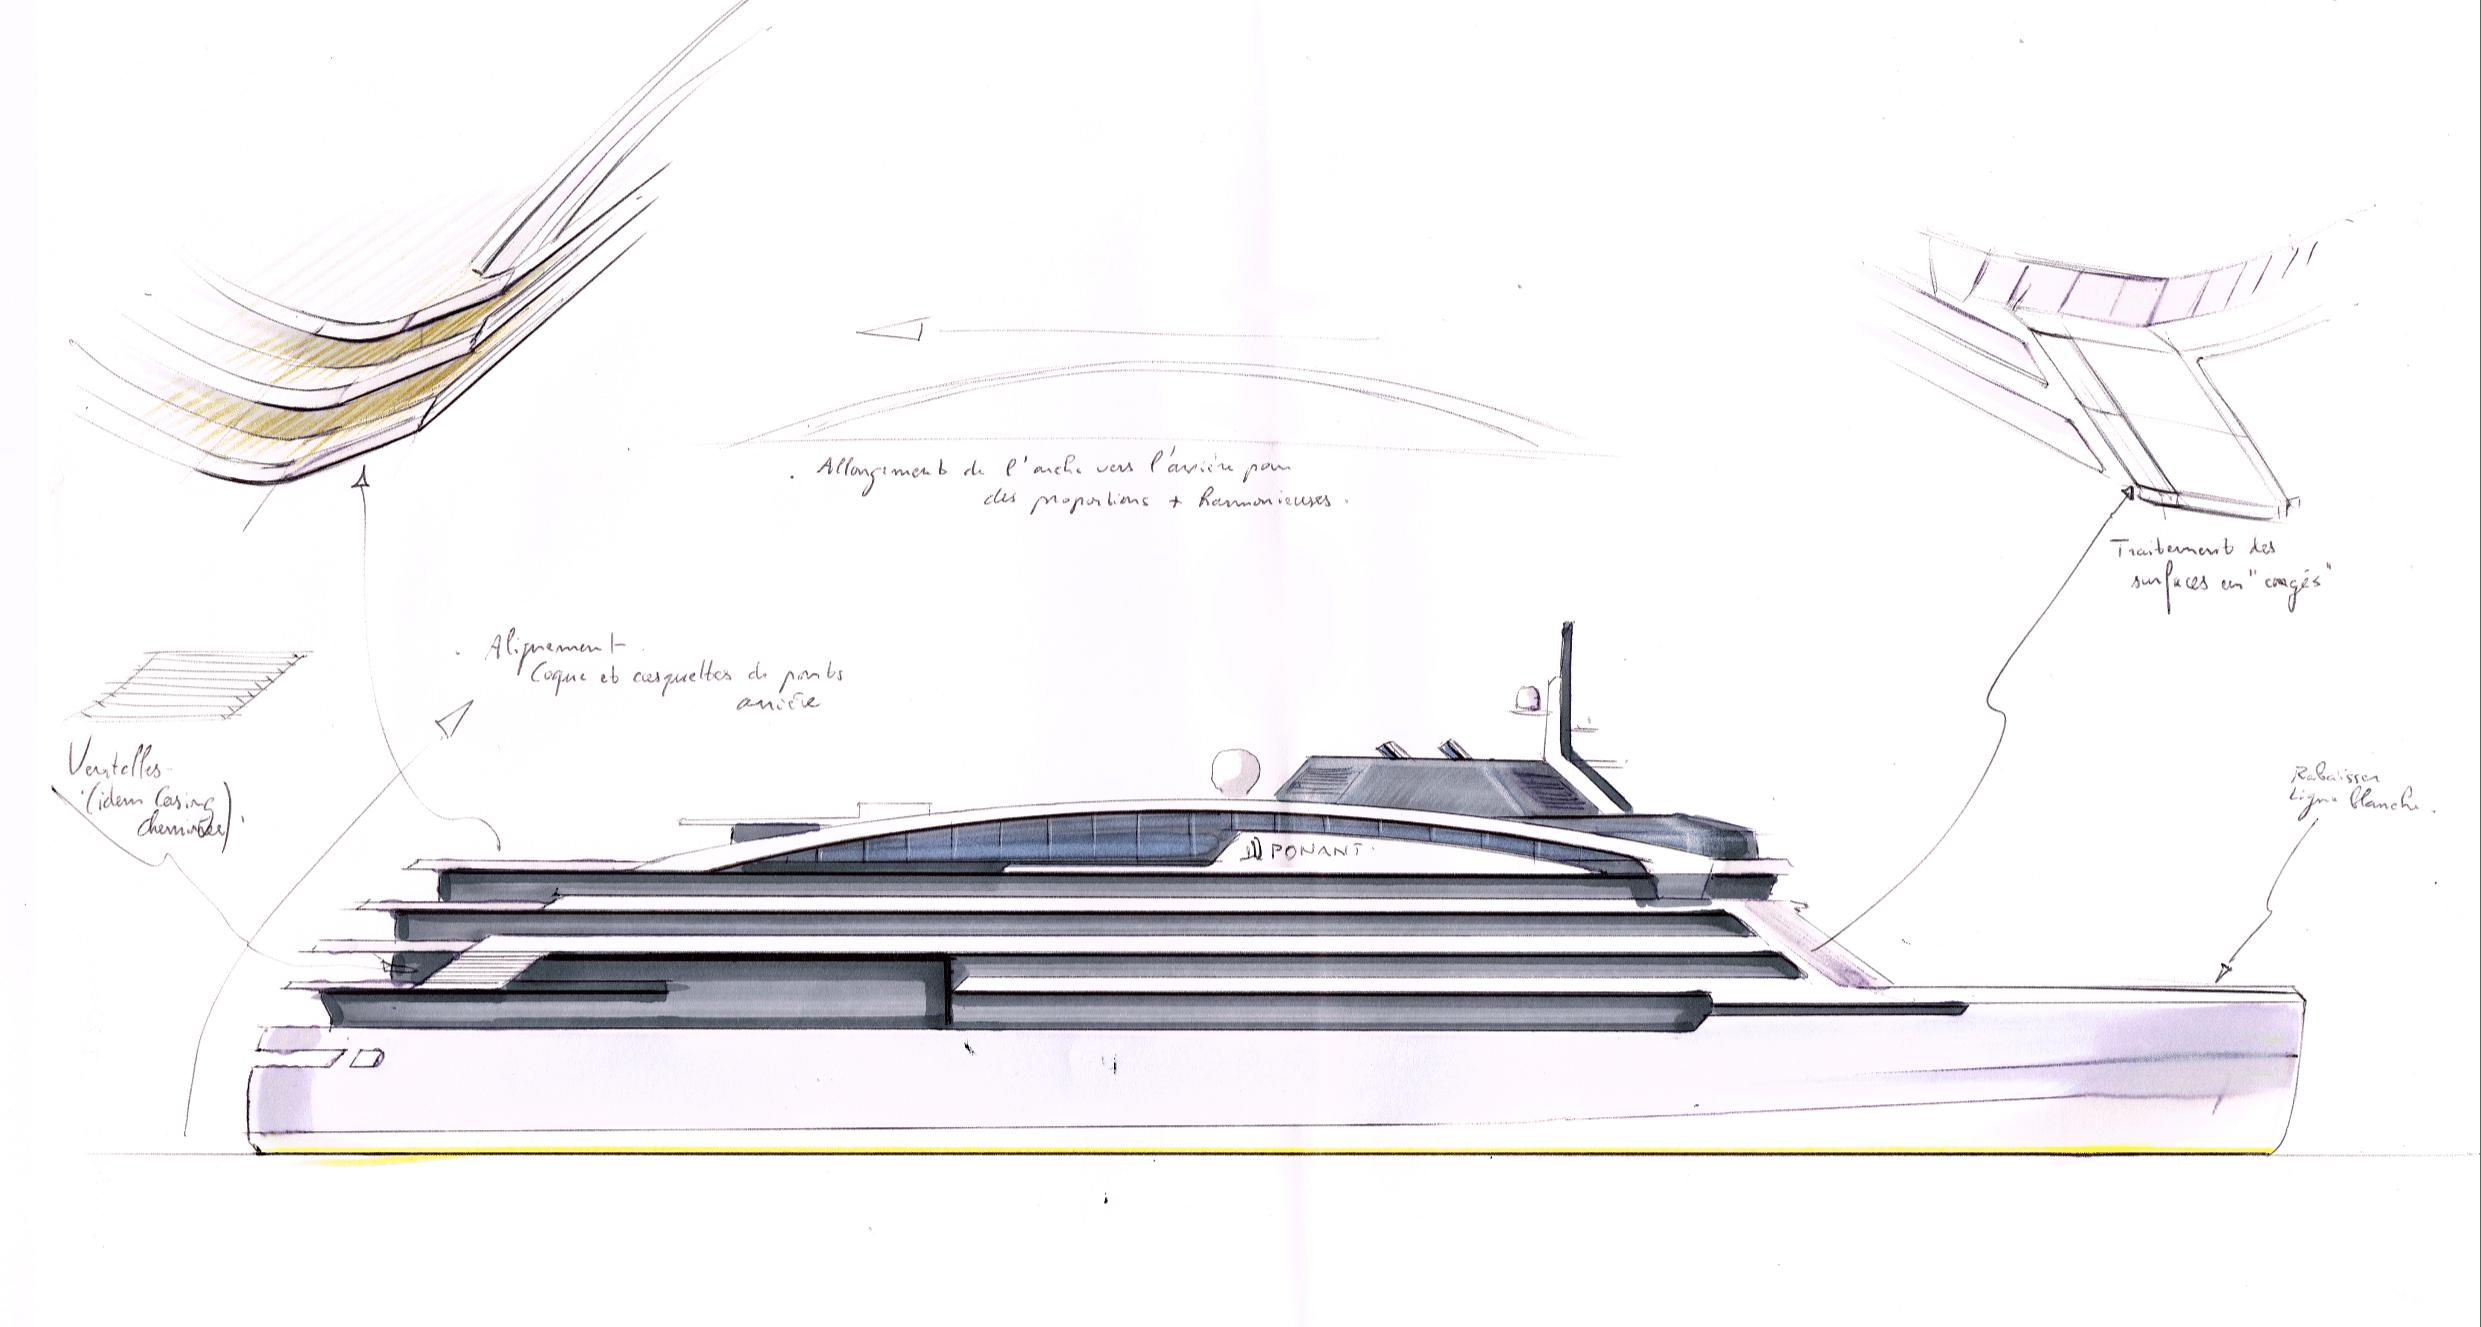 Planches croquis_global design © PONANT_STIRLING DESIGN INTERNATIONAL (1)